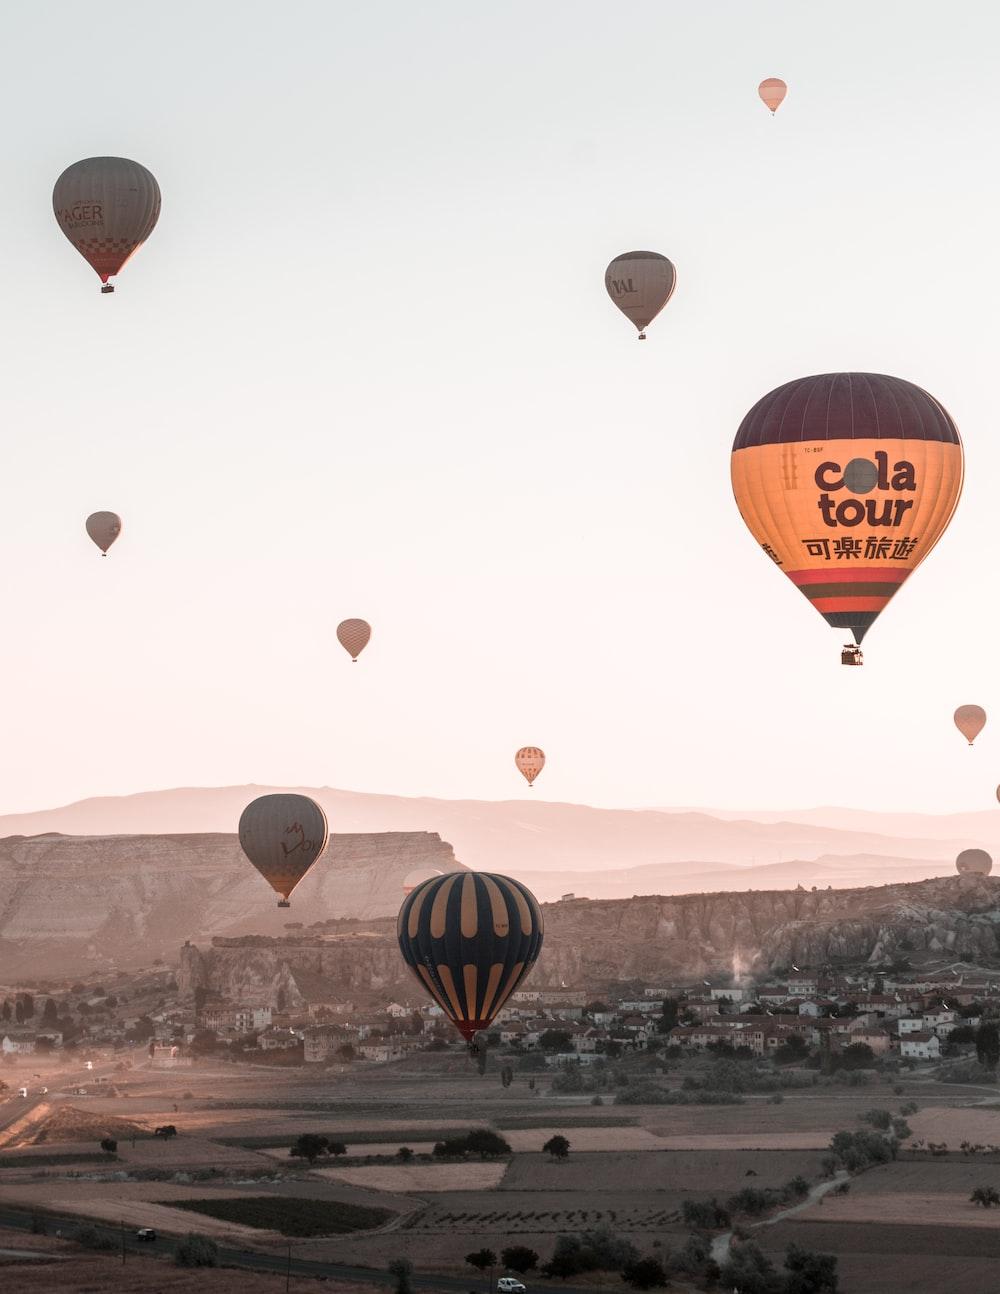 black and yellow Cola Tour hot air balloon